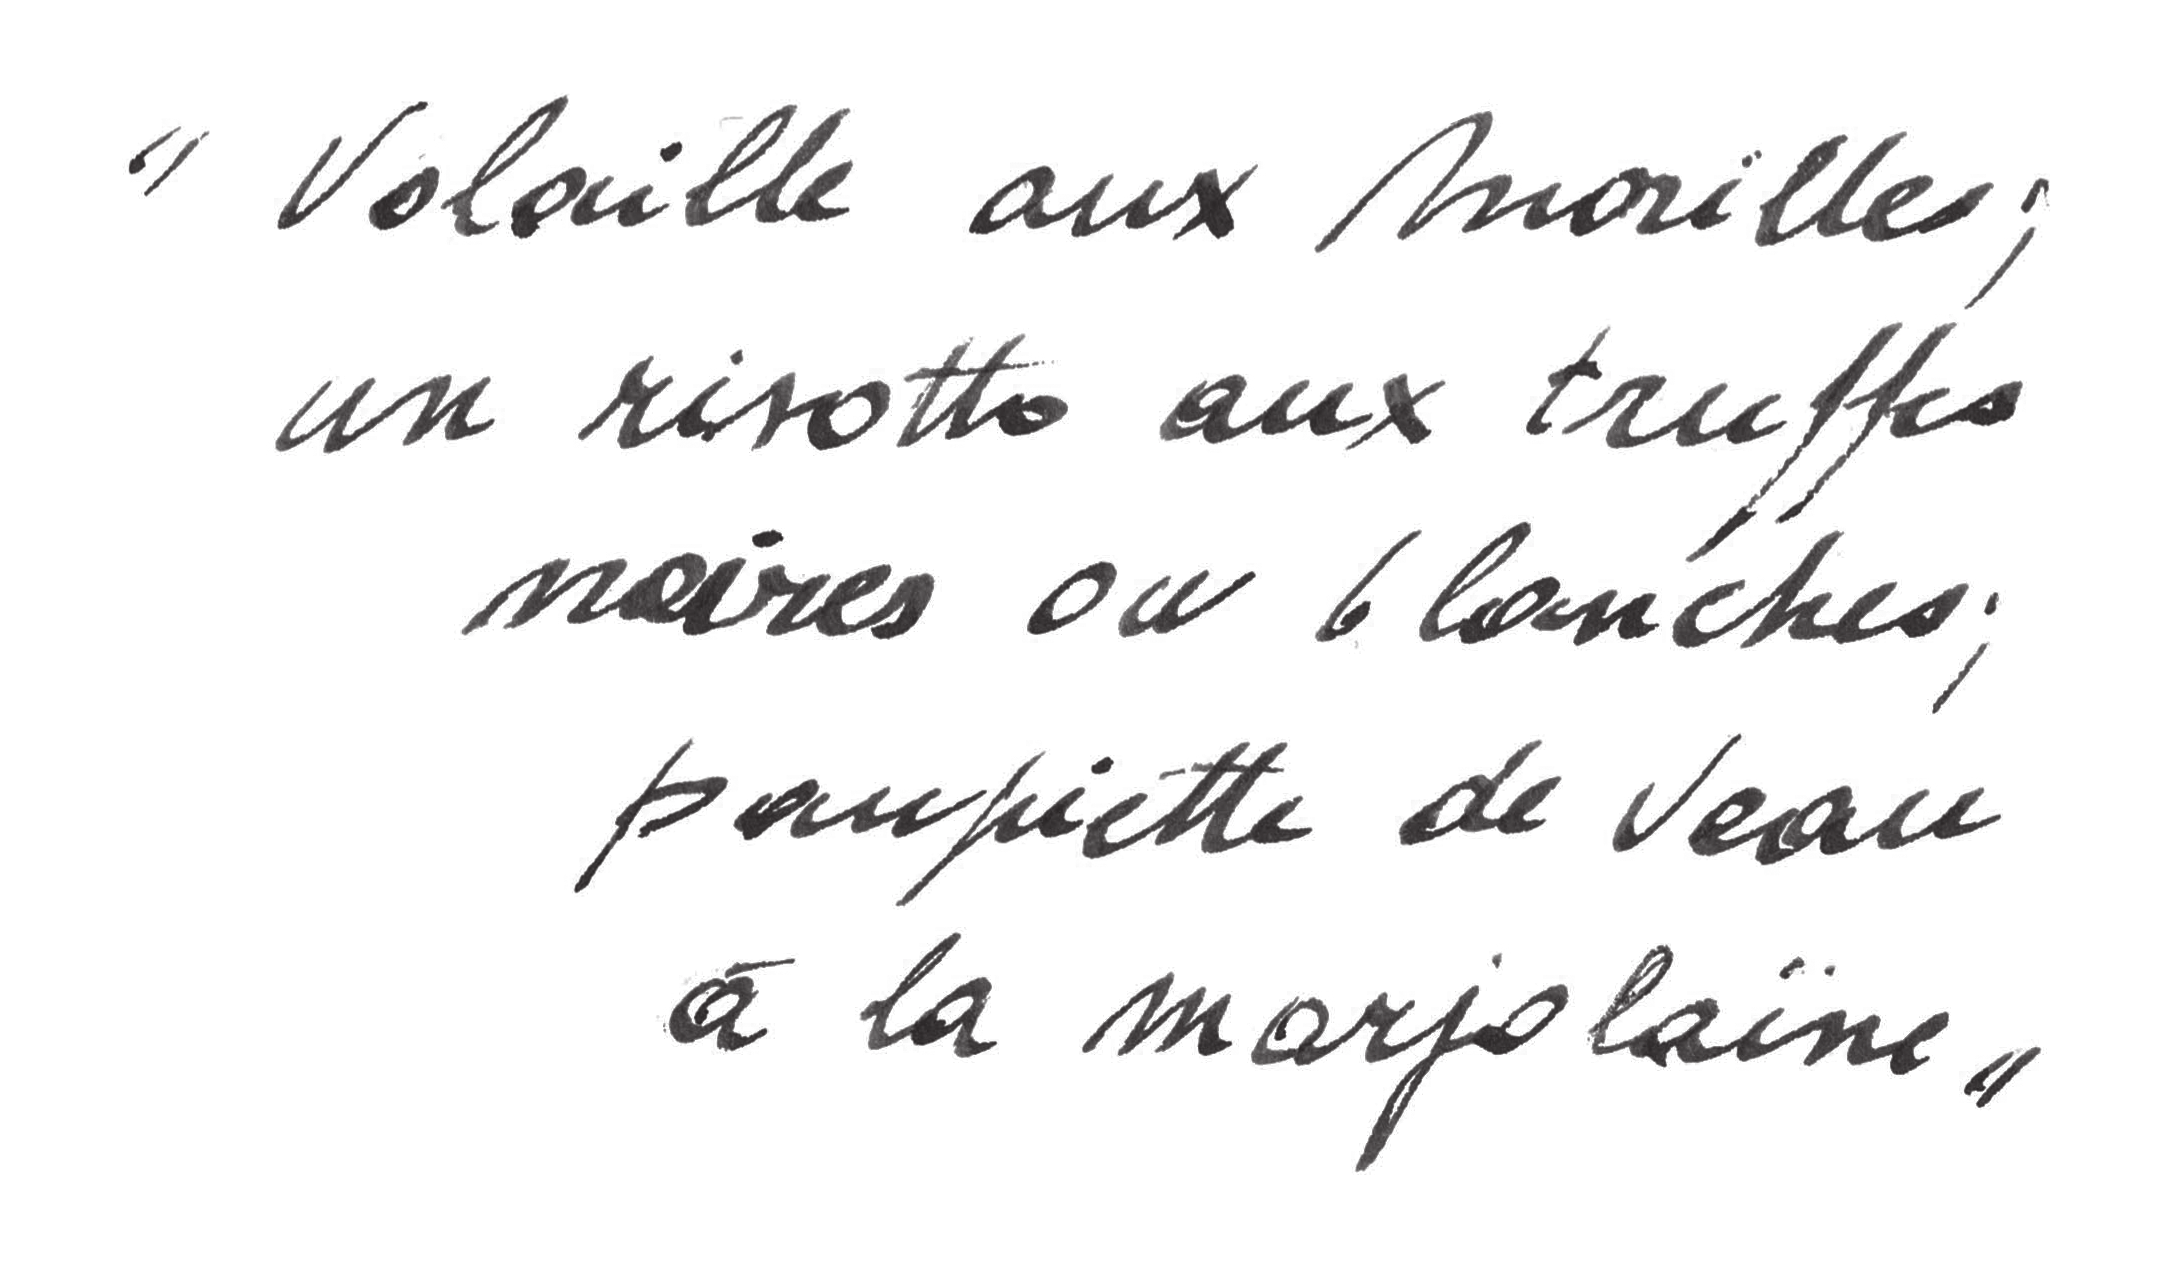 texte_Amedee